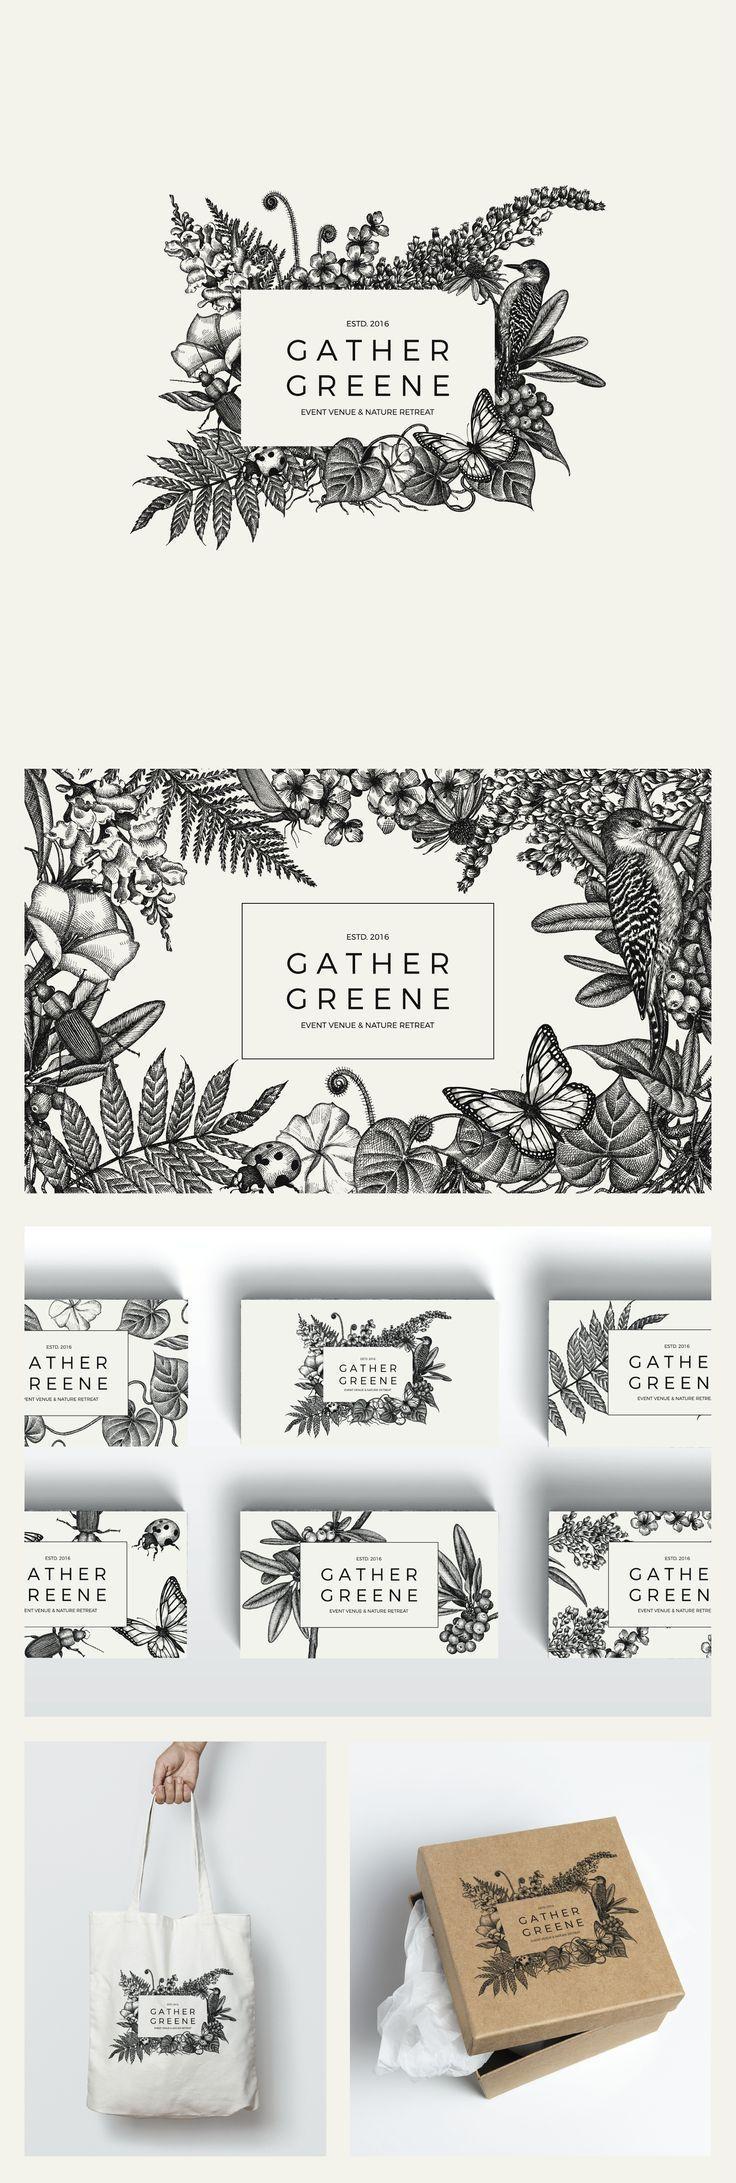 Designs | New Event Venue Gather Greene seeks botanically inspired logo design | Logo & brand identity pack contest